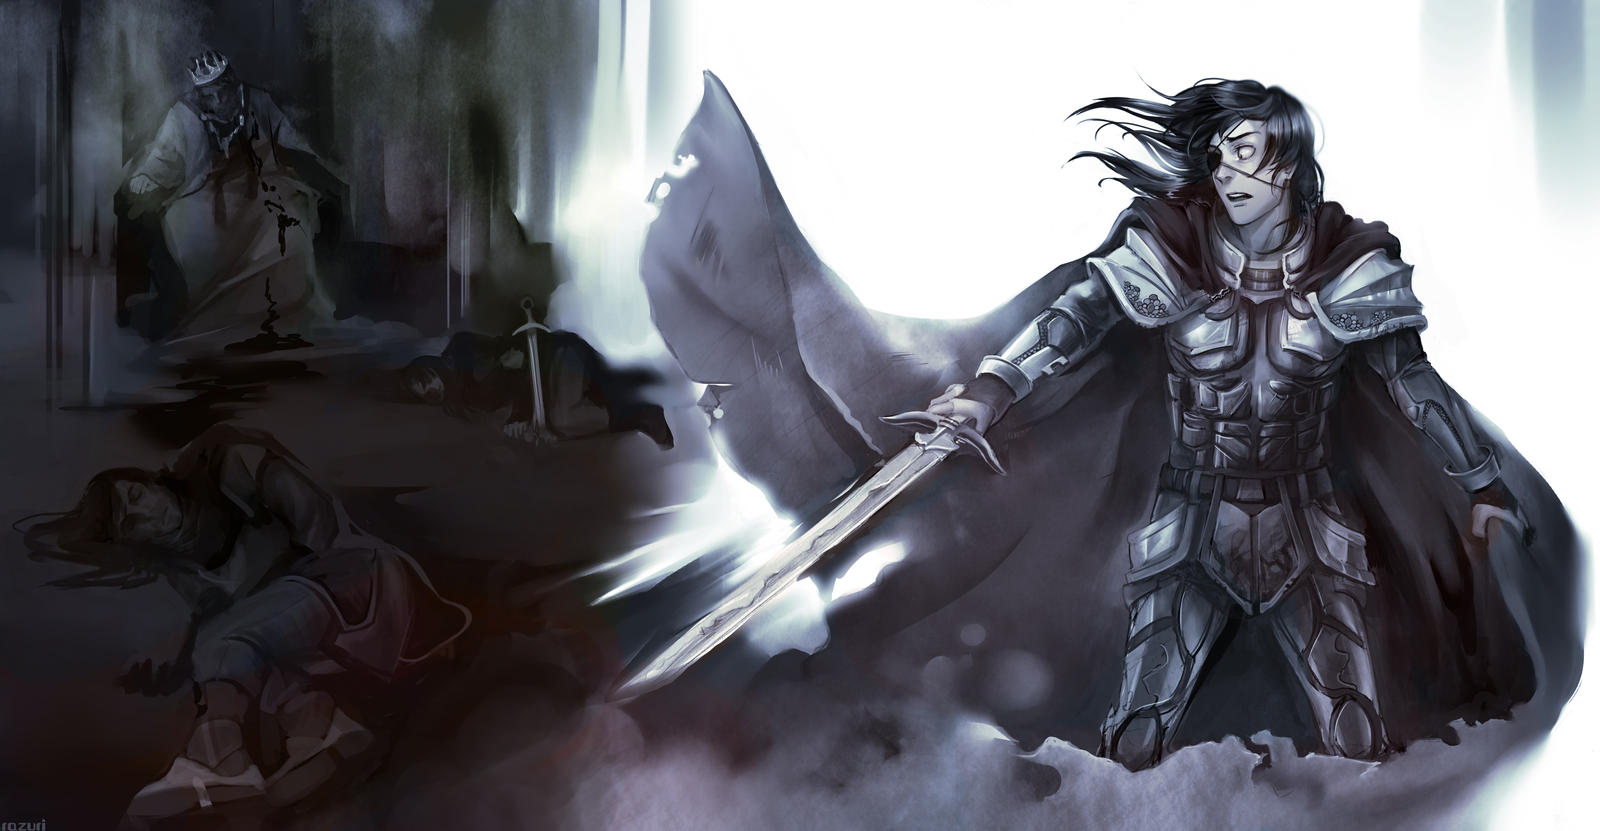 The Duty Shed by Lapis-Razuri